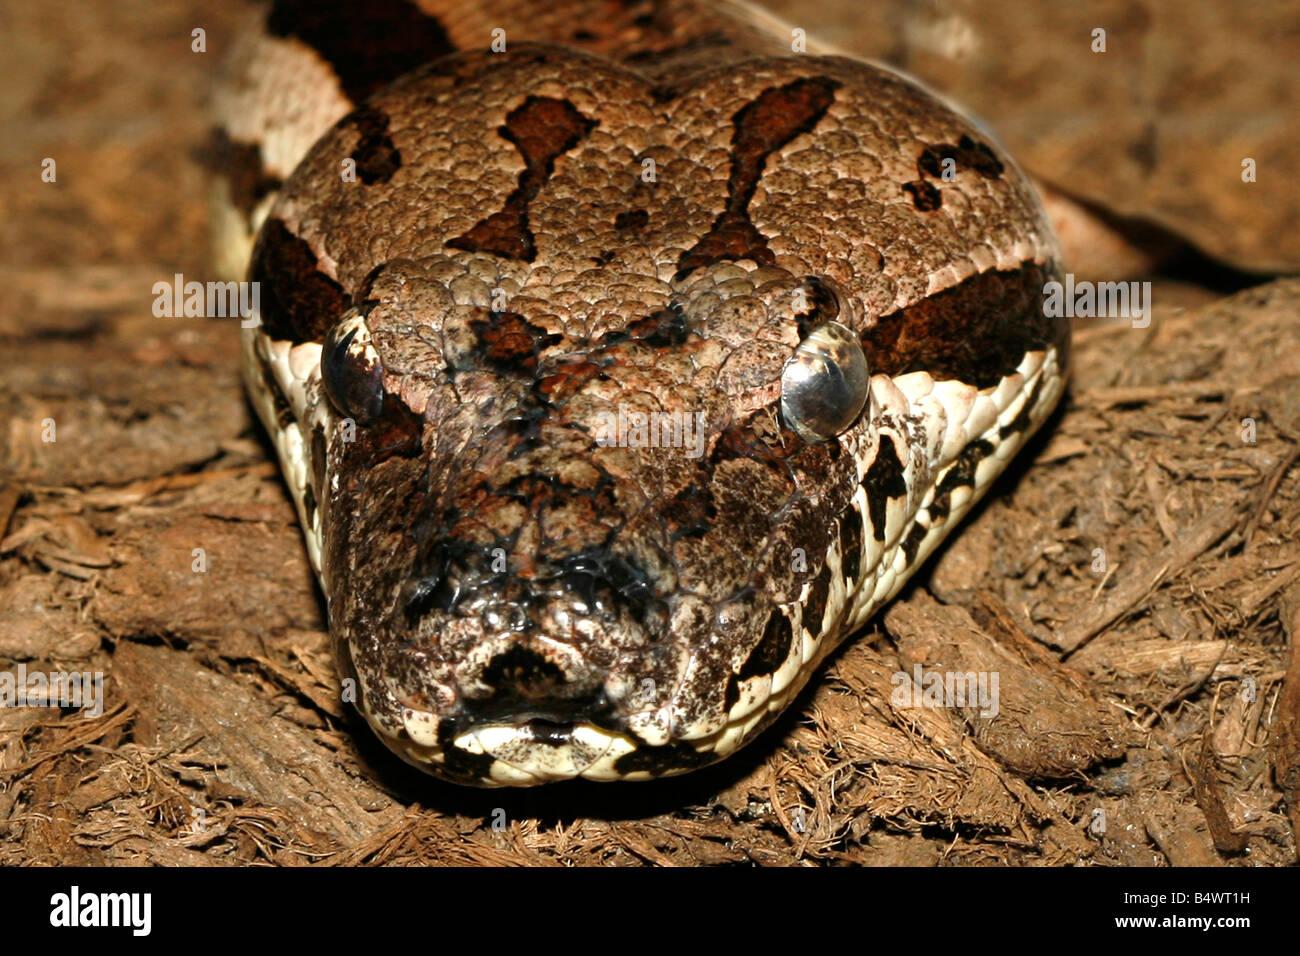 Close up photo of a timber rattlesnake taken with macro lens Scientific Name Agkistrodon piscivorus - Stock Image